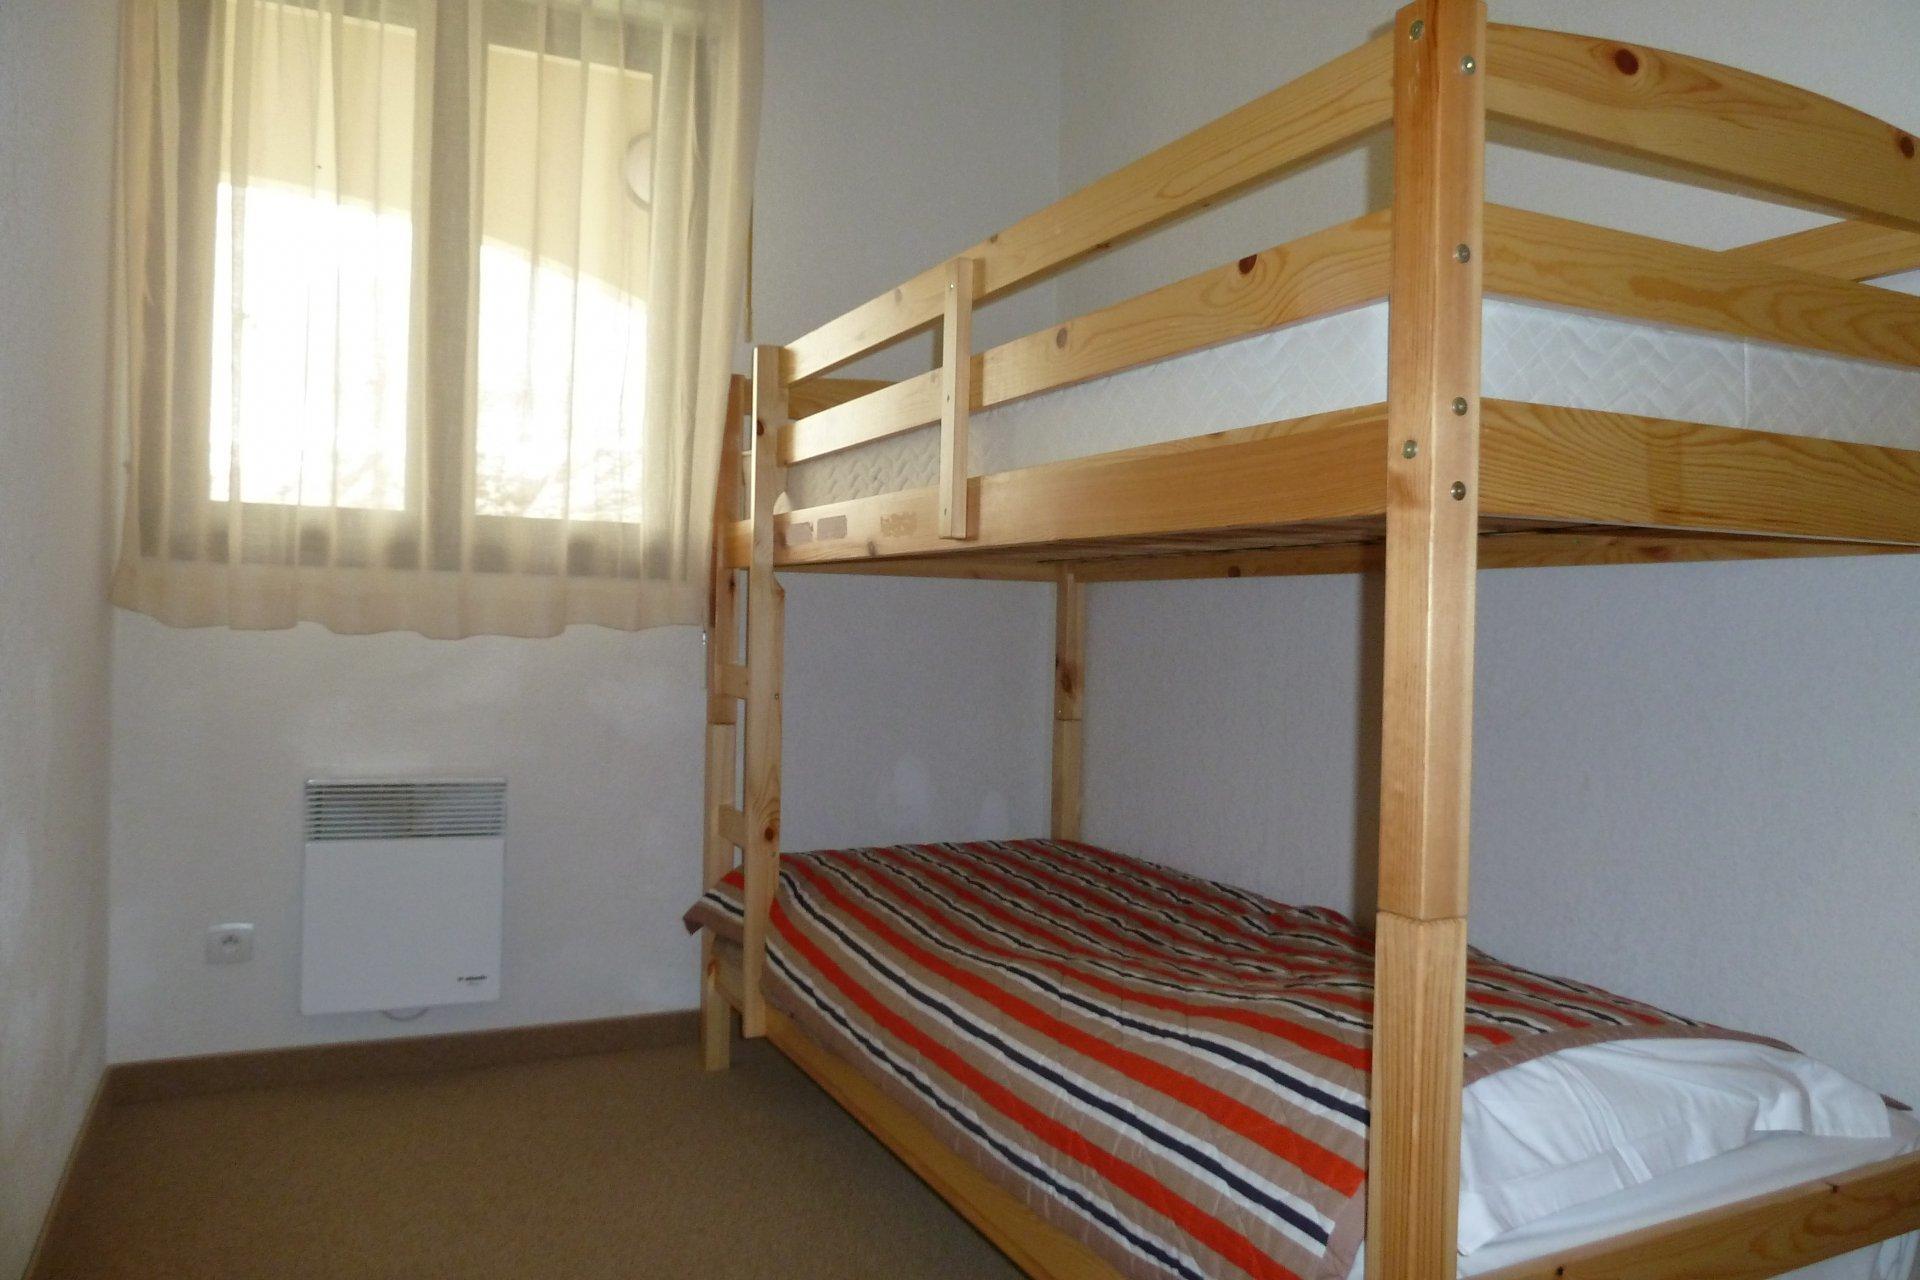 VALBERG 4206 SE 3 PIECES 43.94 m²